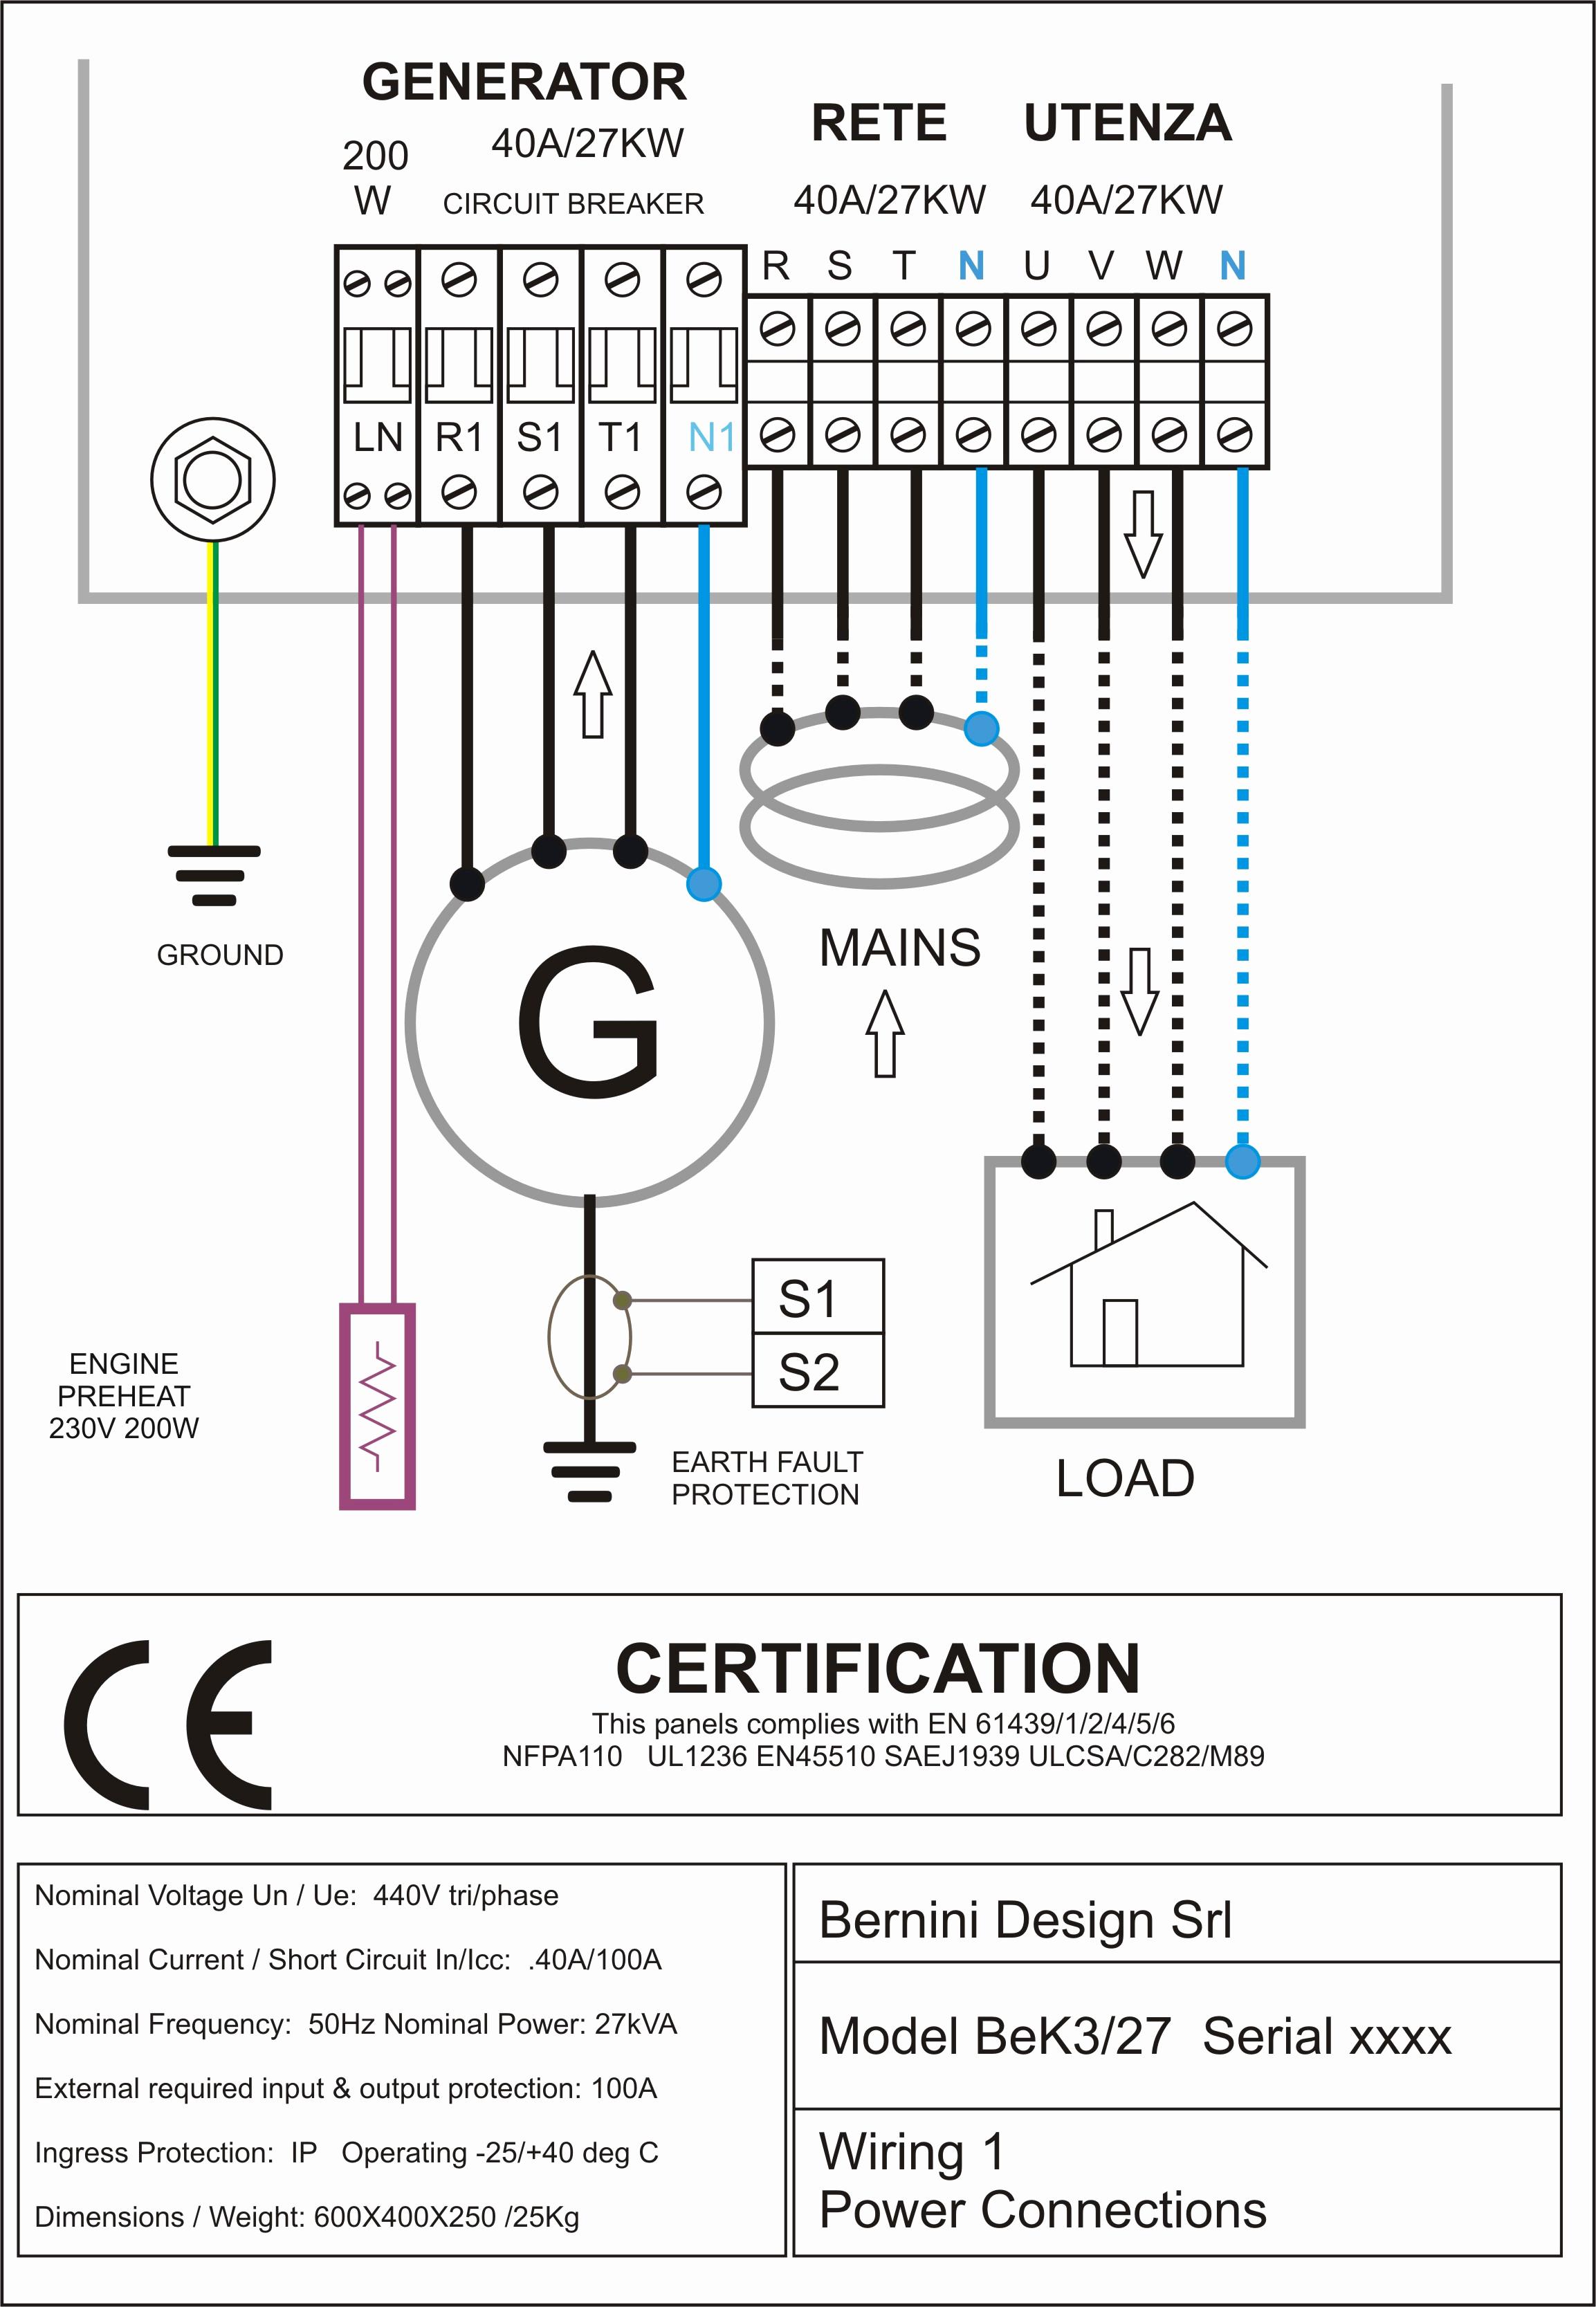 NZ_9613] Electric Motor Capacitor Wiring Diagram Model Gk63Lb Wiring DiagramFuni Icism Viewor Mohammedshrine Librar Wiring 101